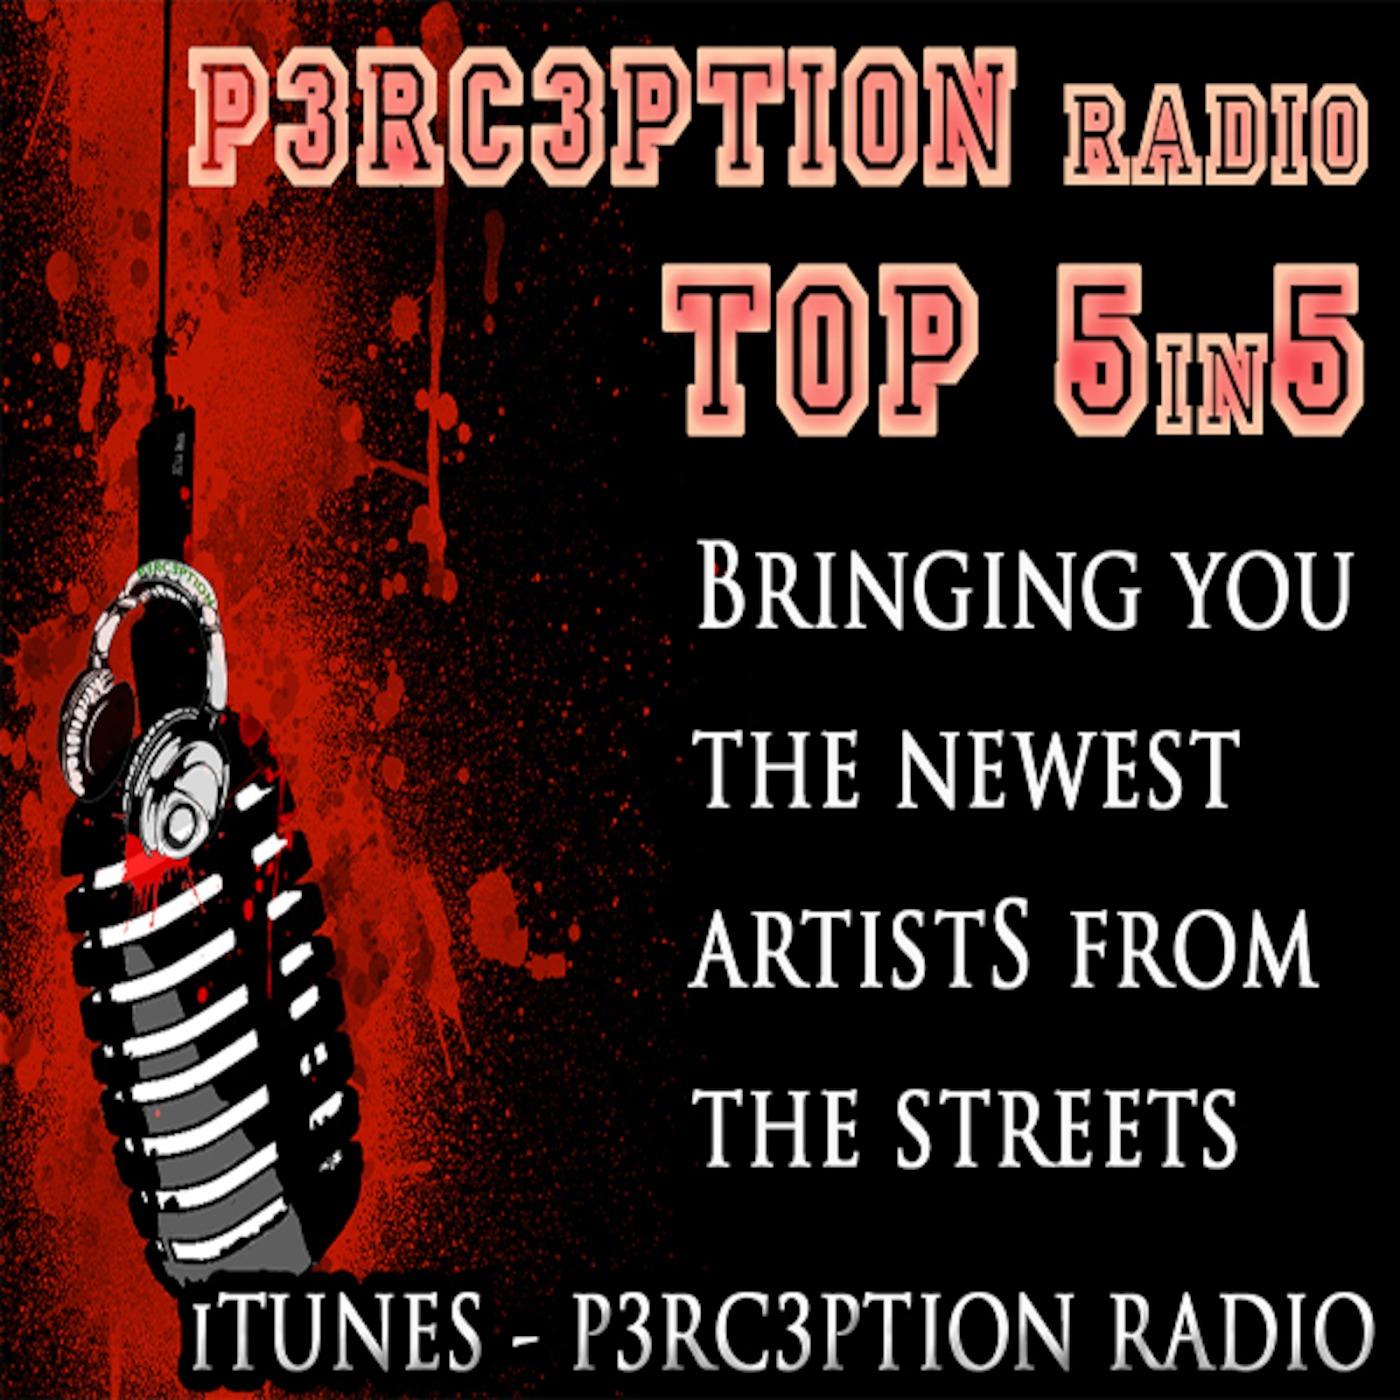 P3RC3PTION Radio